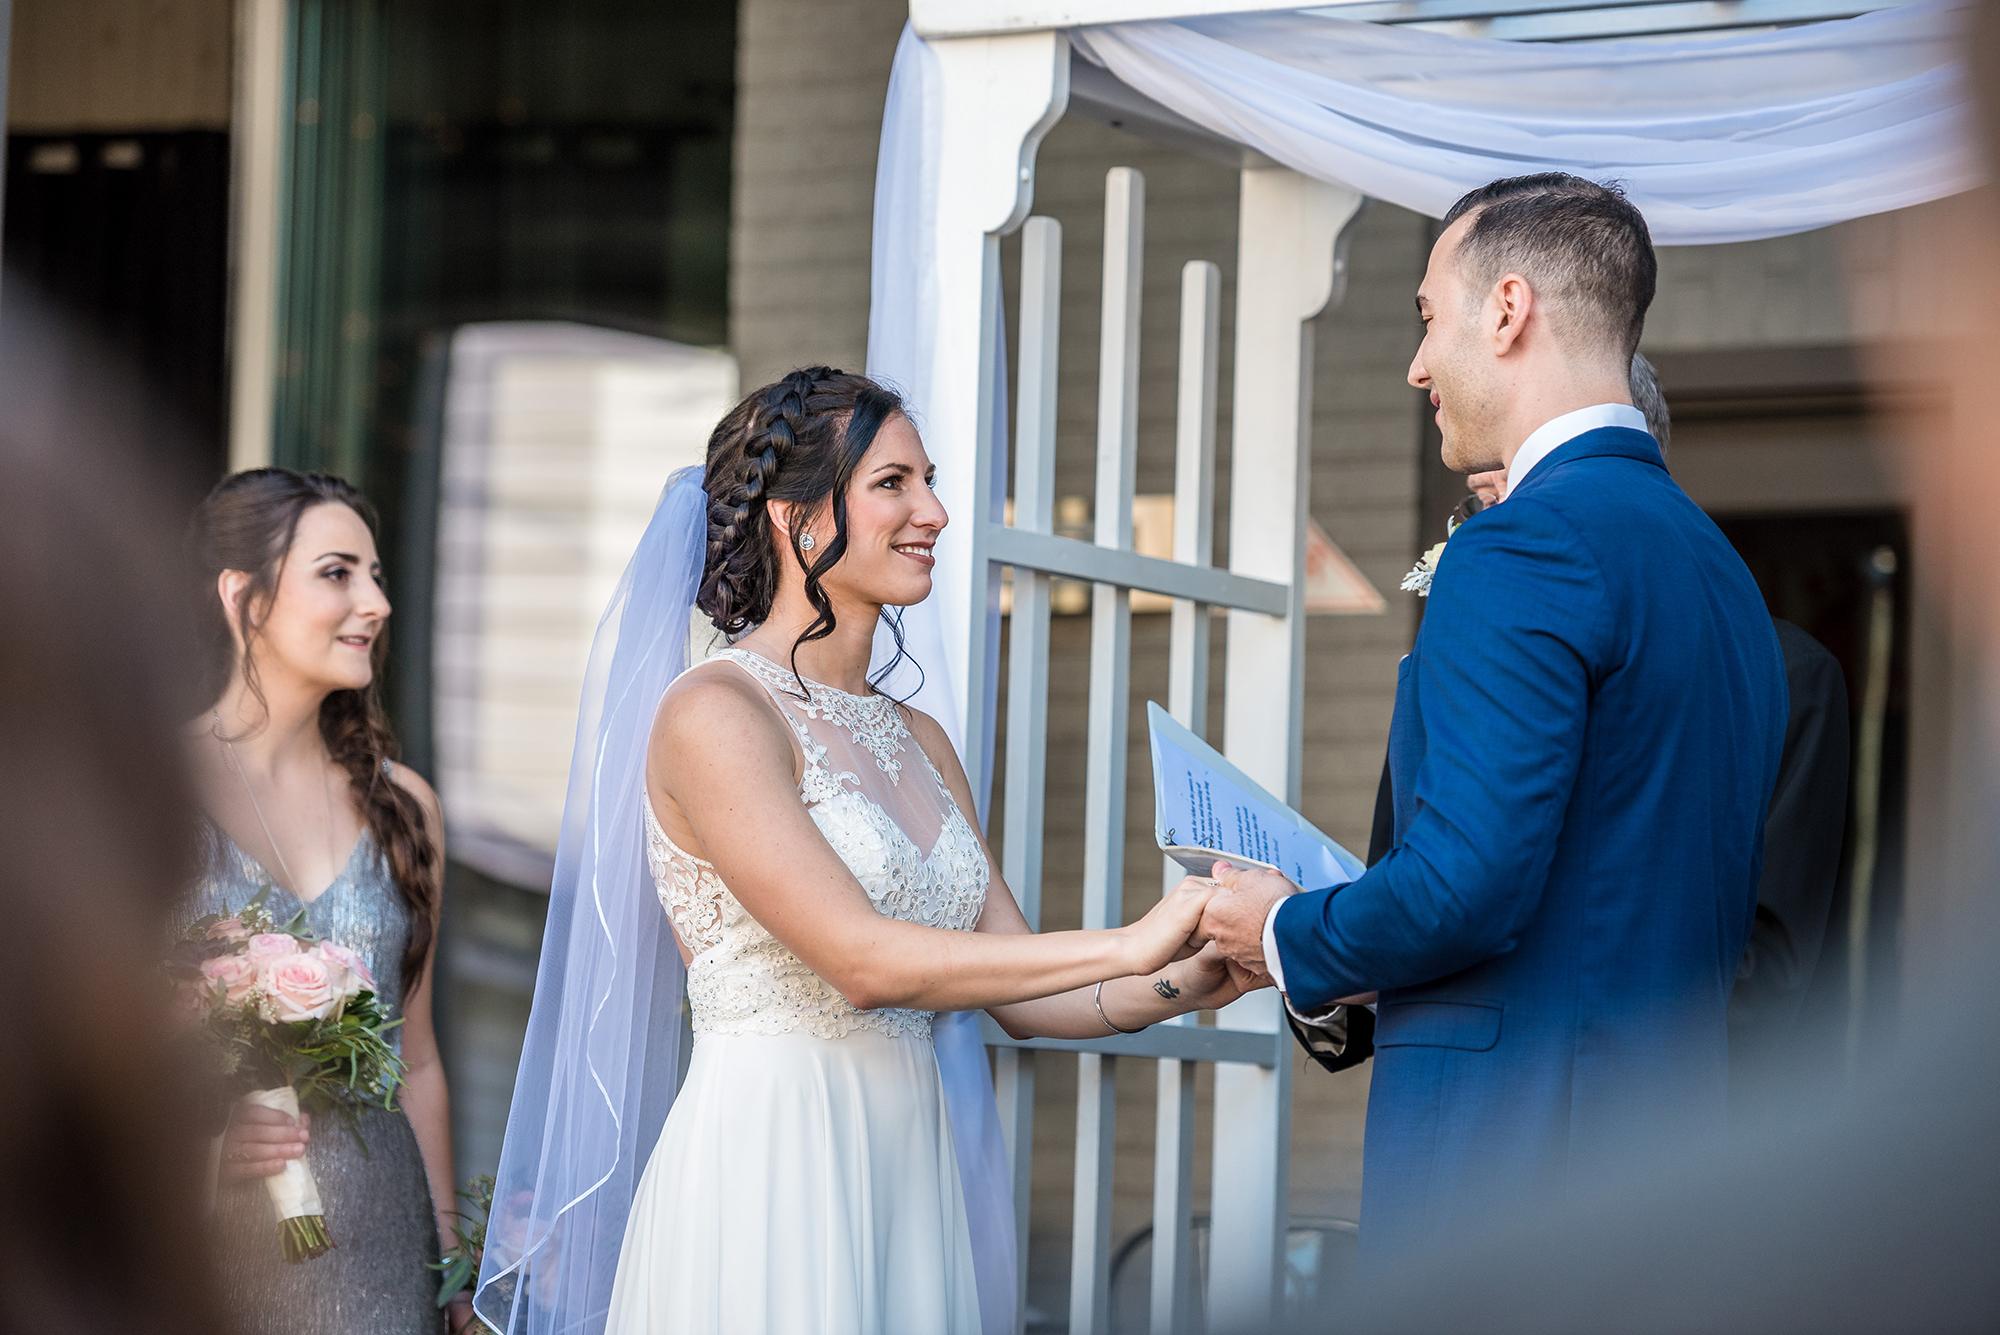 trenos-wedding-lbi-photographer-27.jpg